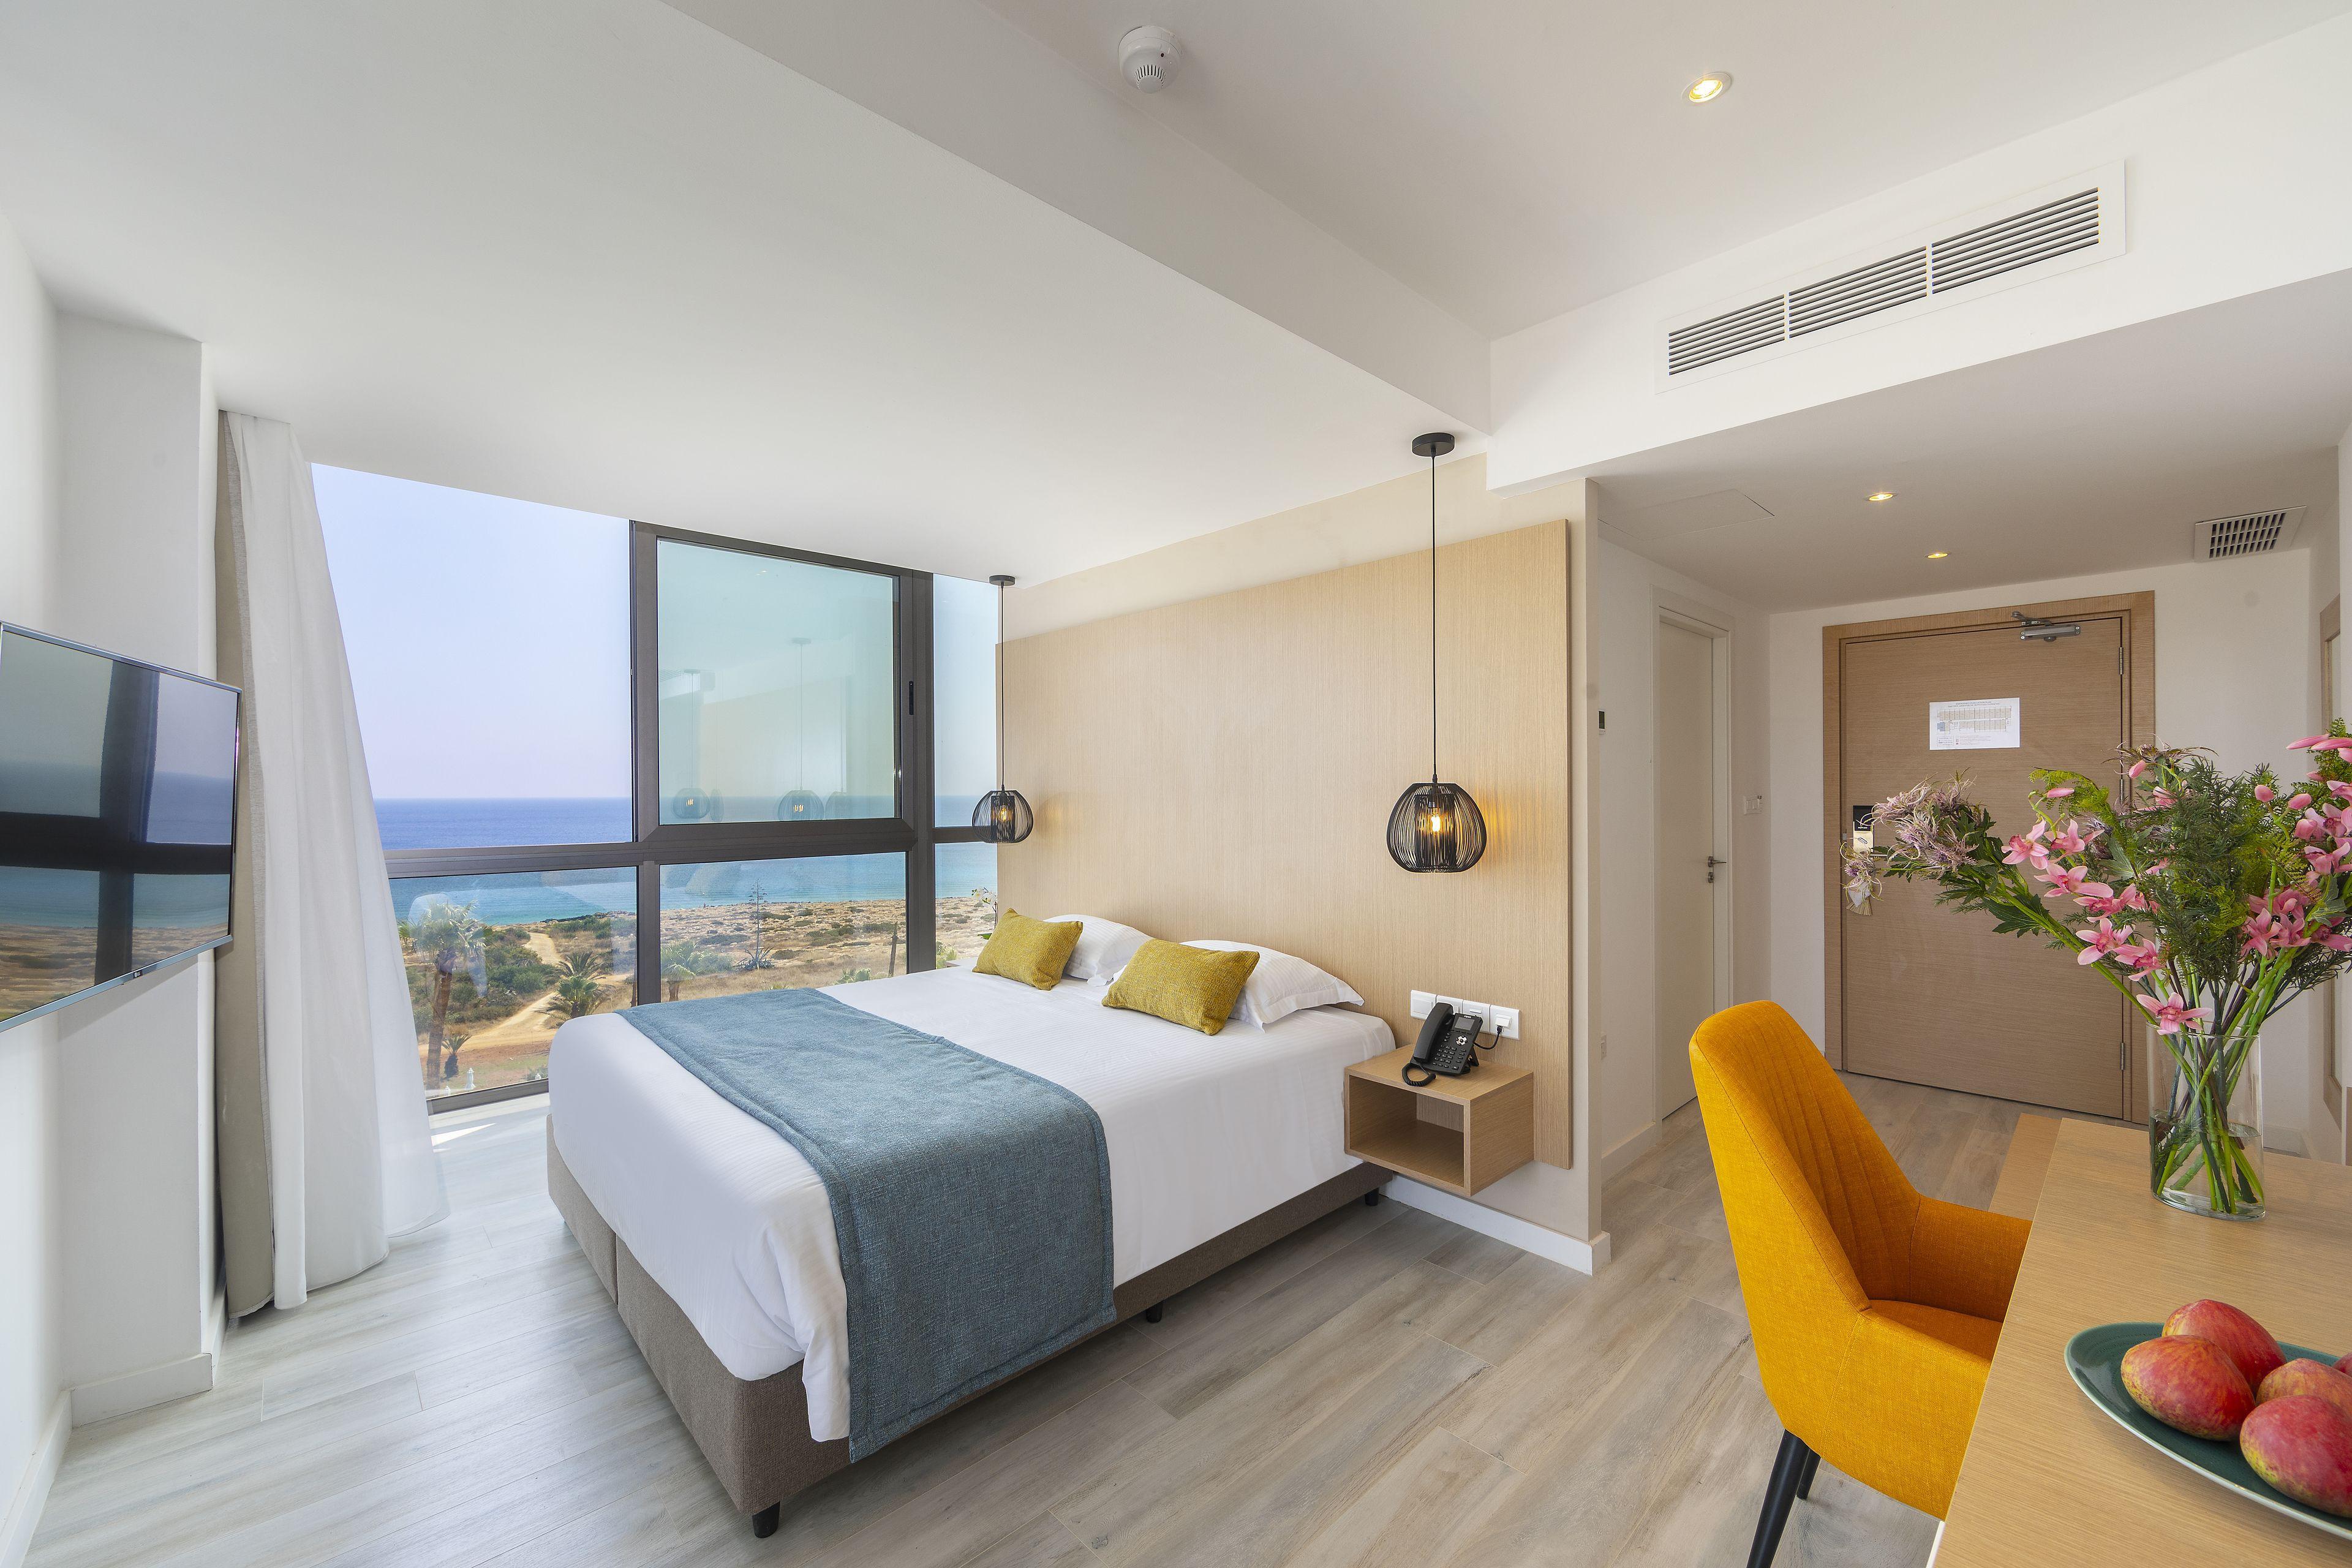 Courtesy of Leonardo Crystal Cove Hotel and Spa by the Sea / Expedia